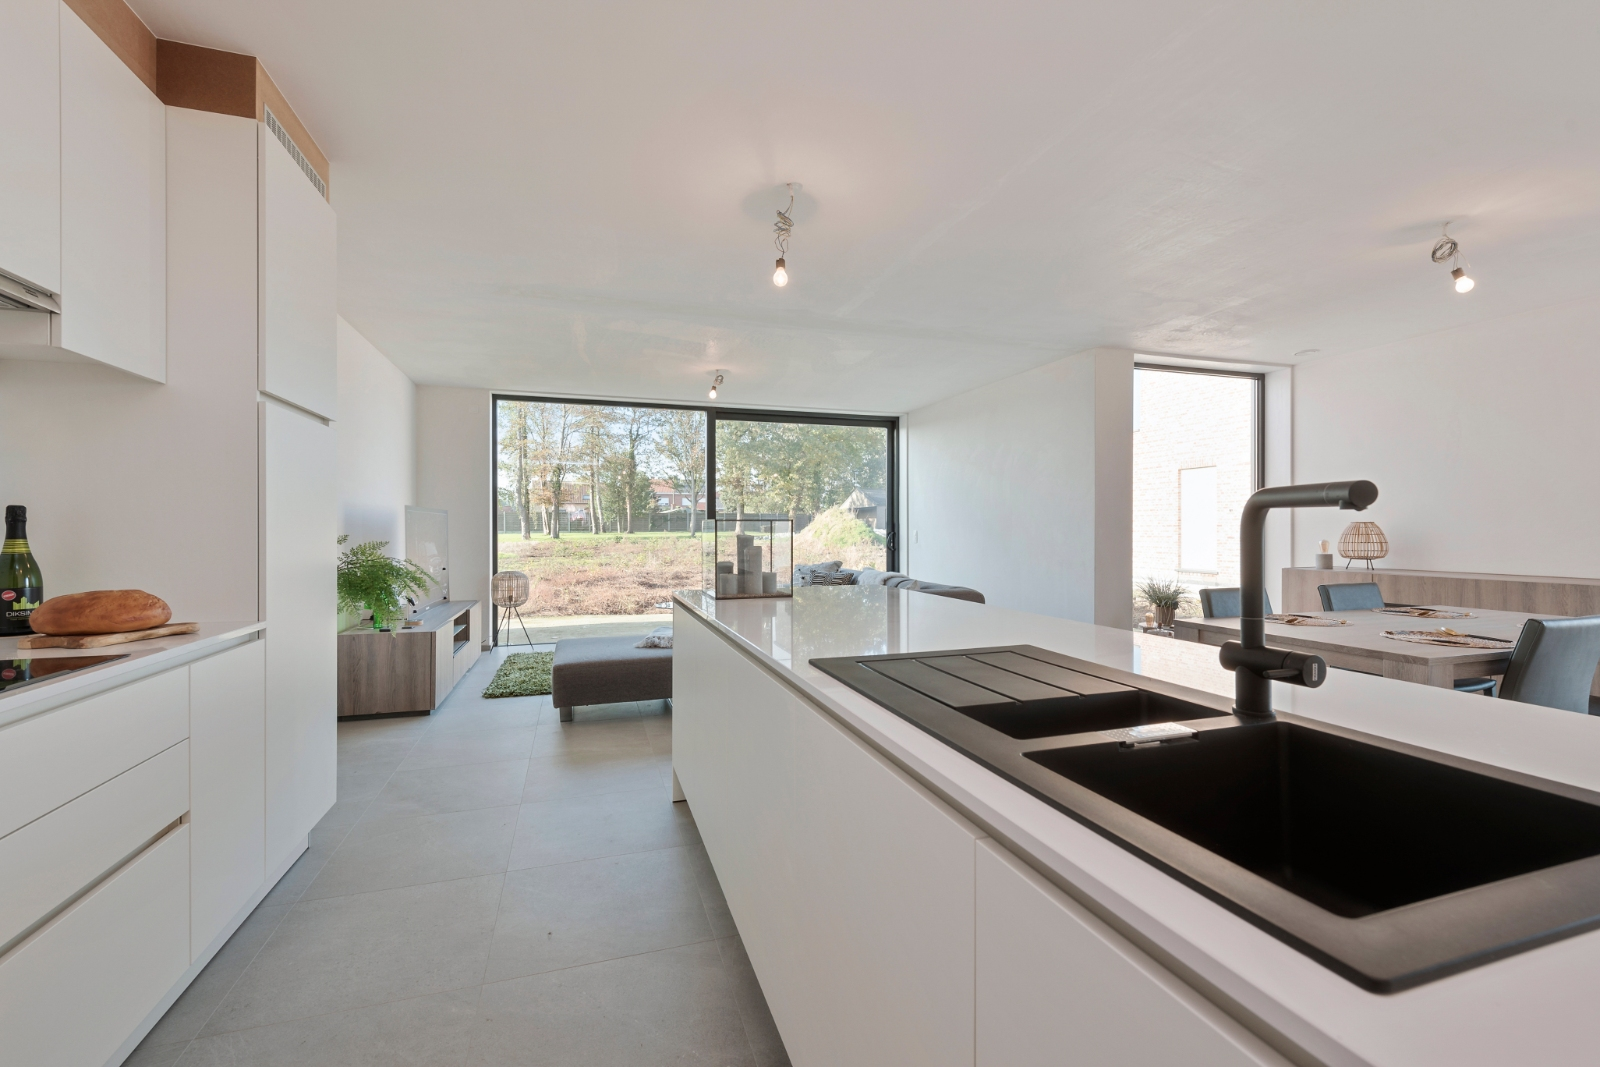 Prachtige moderne nieuwbouwwoning nabij centrum Esen - 11